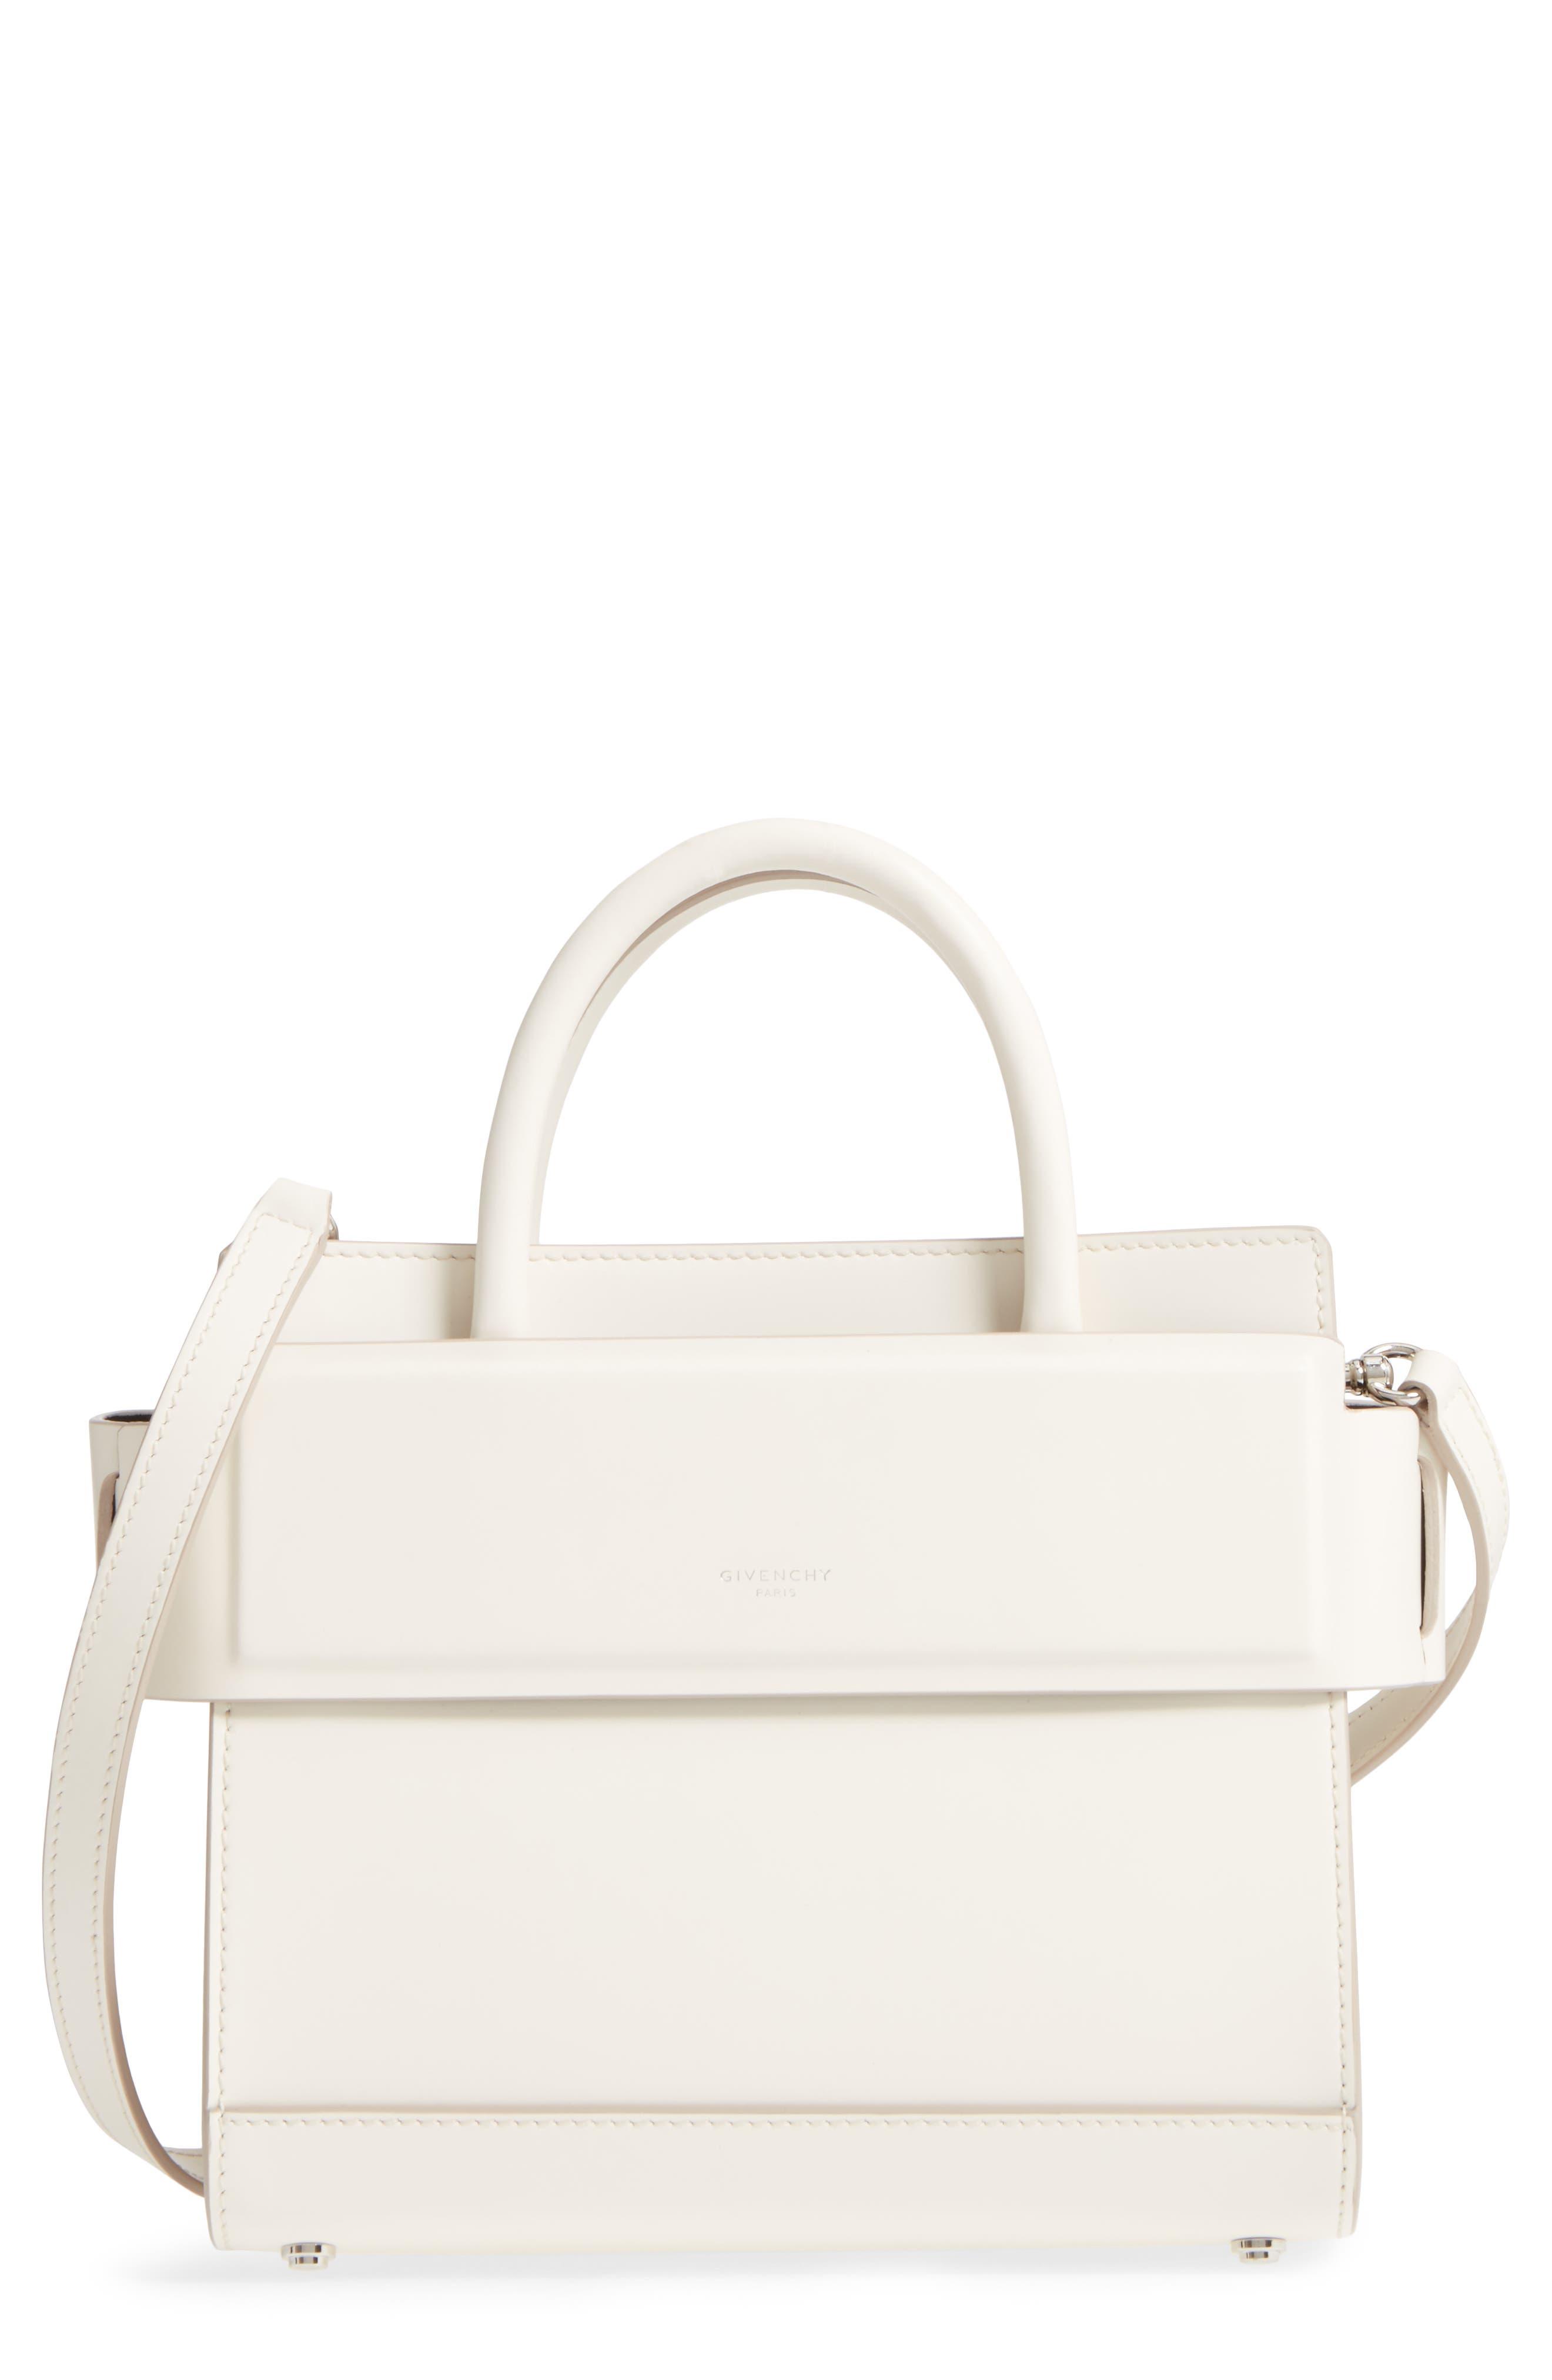 Mini Horizon Calfskin Leather Tote,                         Main,                         color, Off White